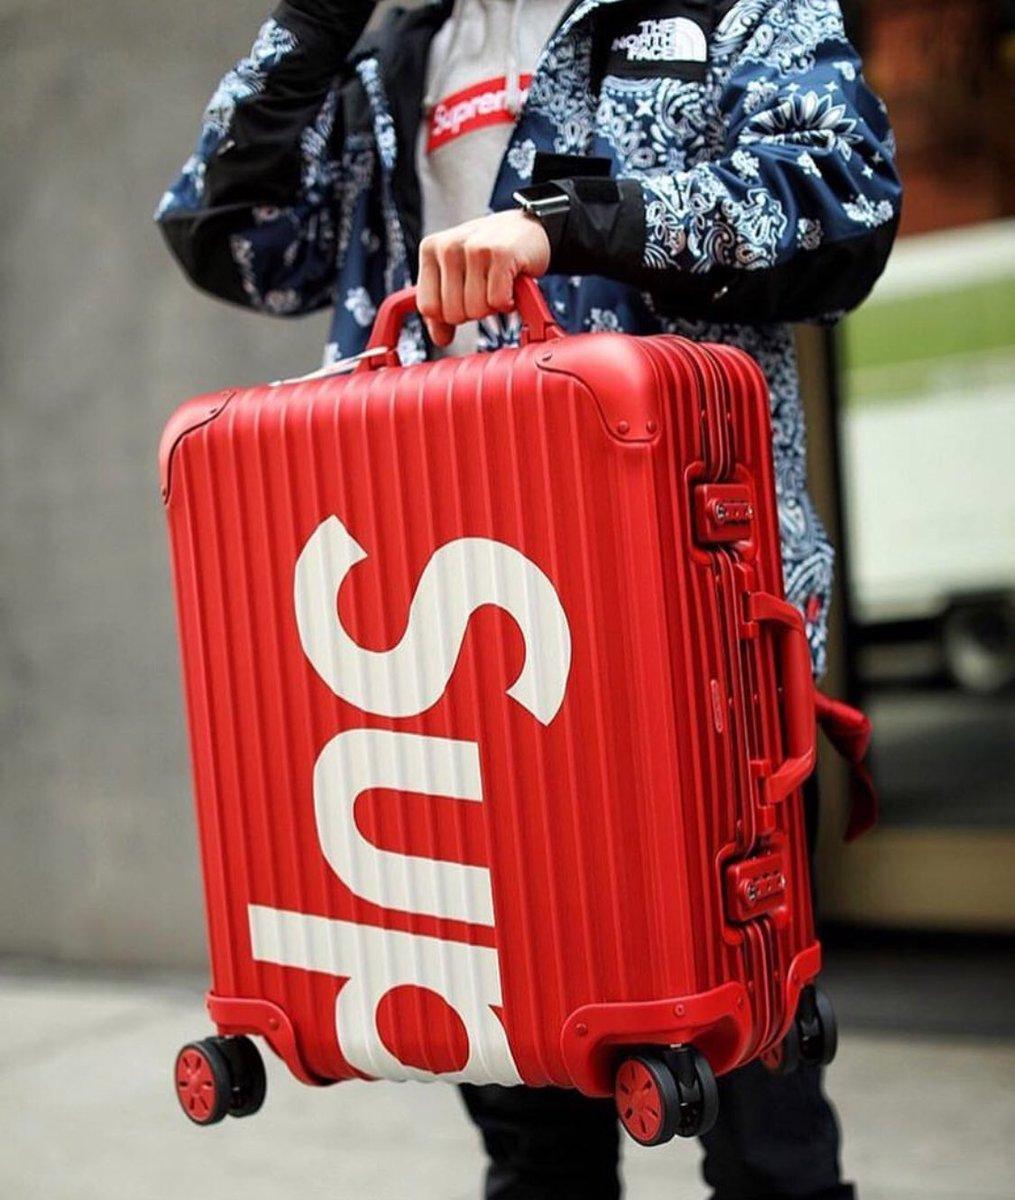 8c44c366a Supreme/Rimowa Suitcase Week 8 📸 pic.twitter.com/o3TIBN9t1i